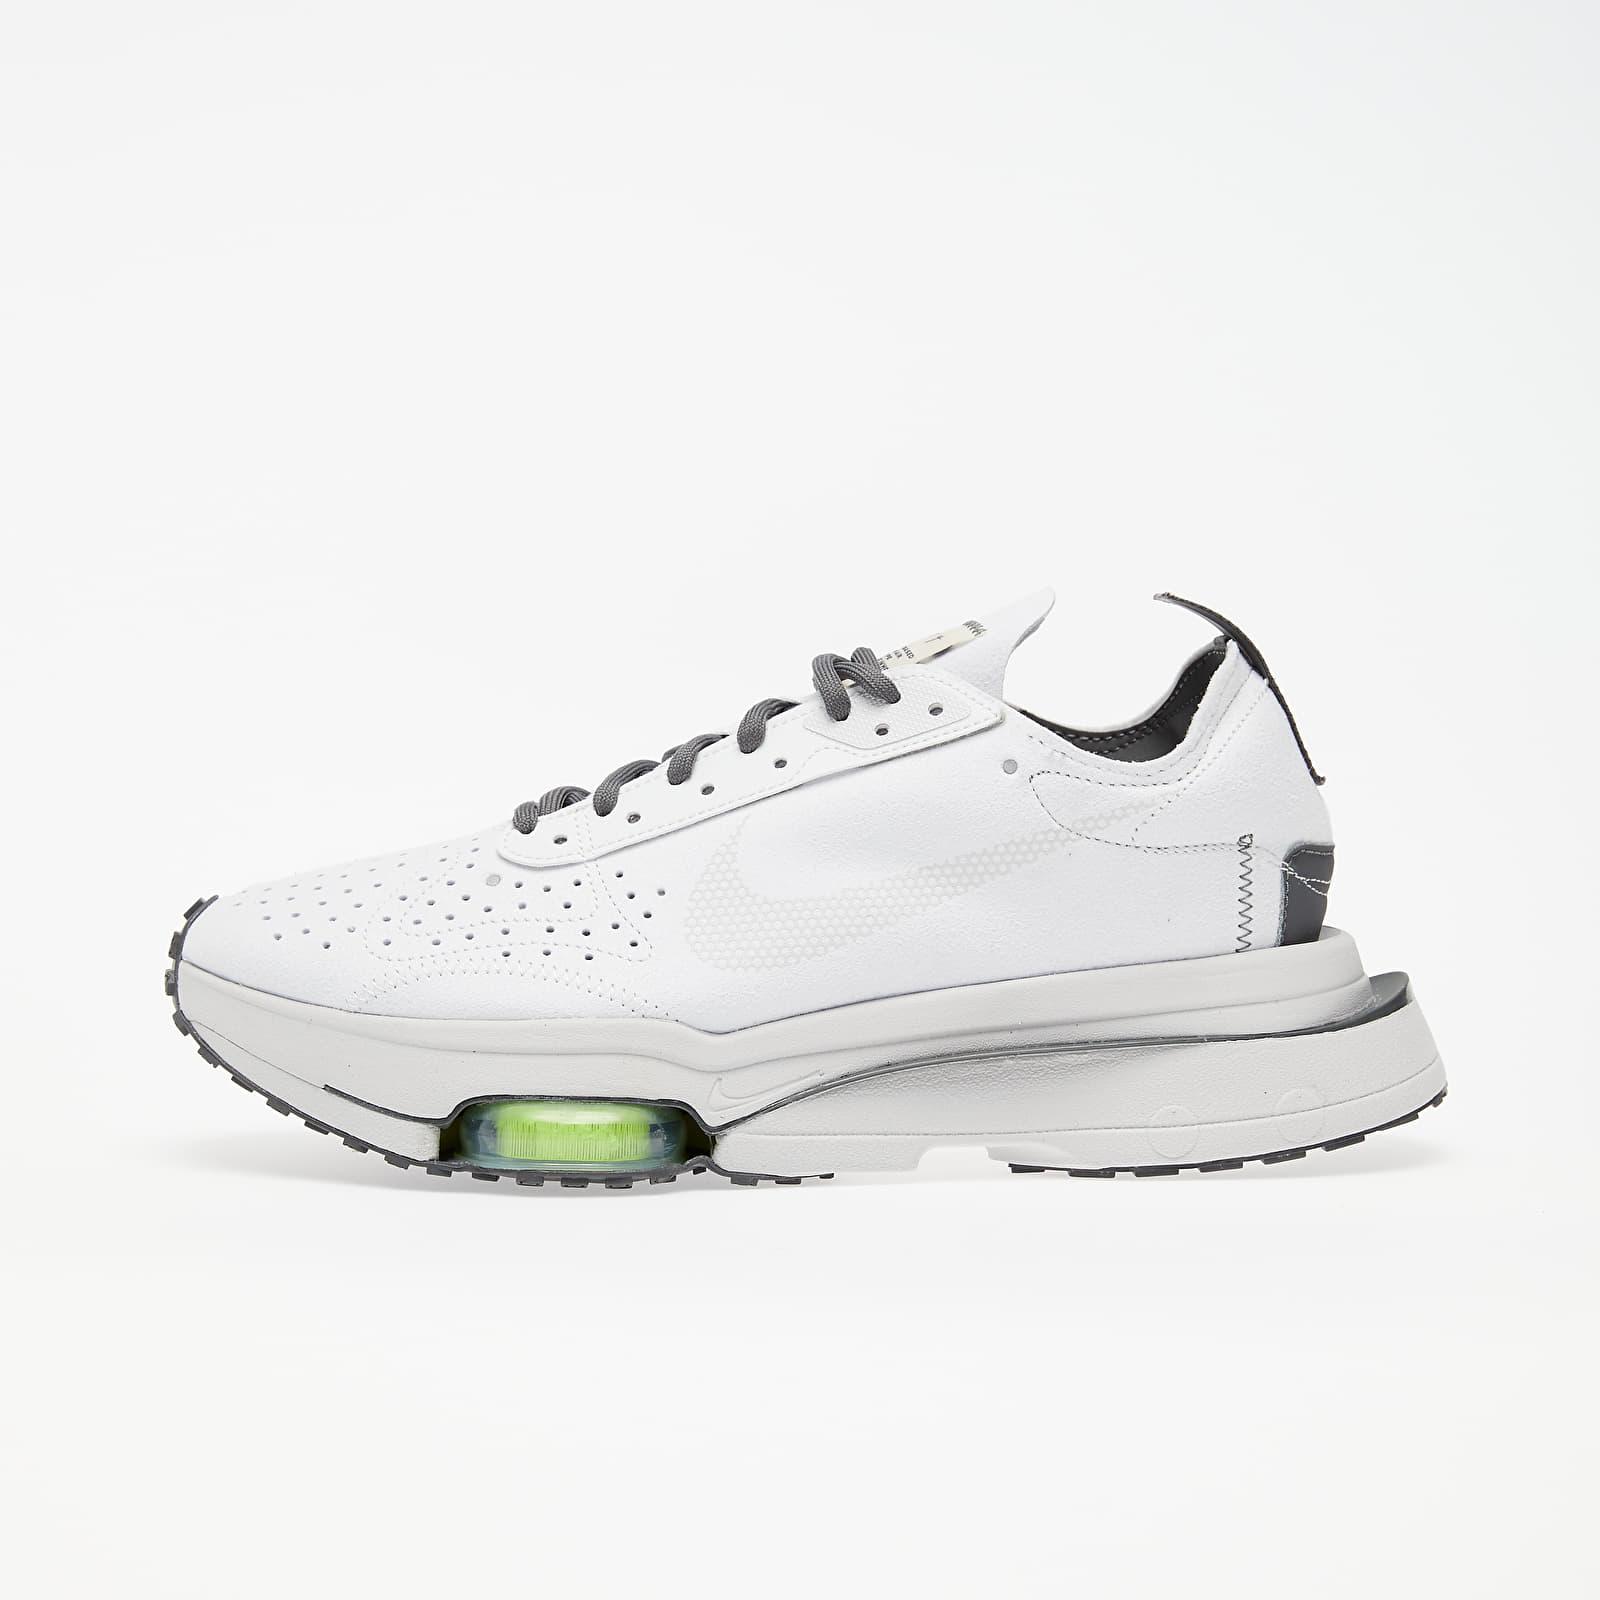 Men's shoes Nike Air Zoom-Type Summit White/ Vast Grey-Iron Grey